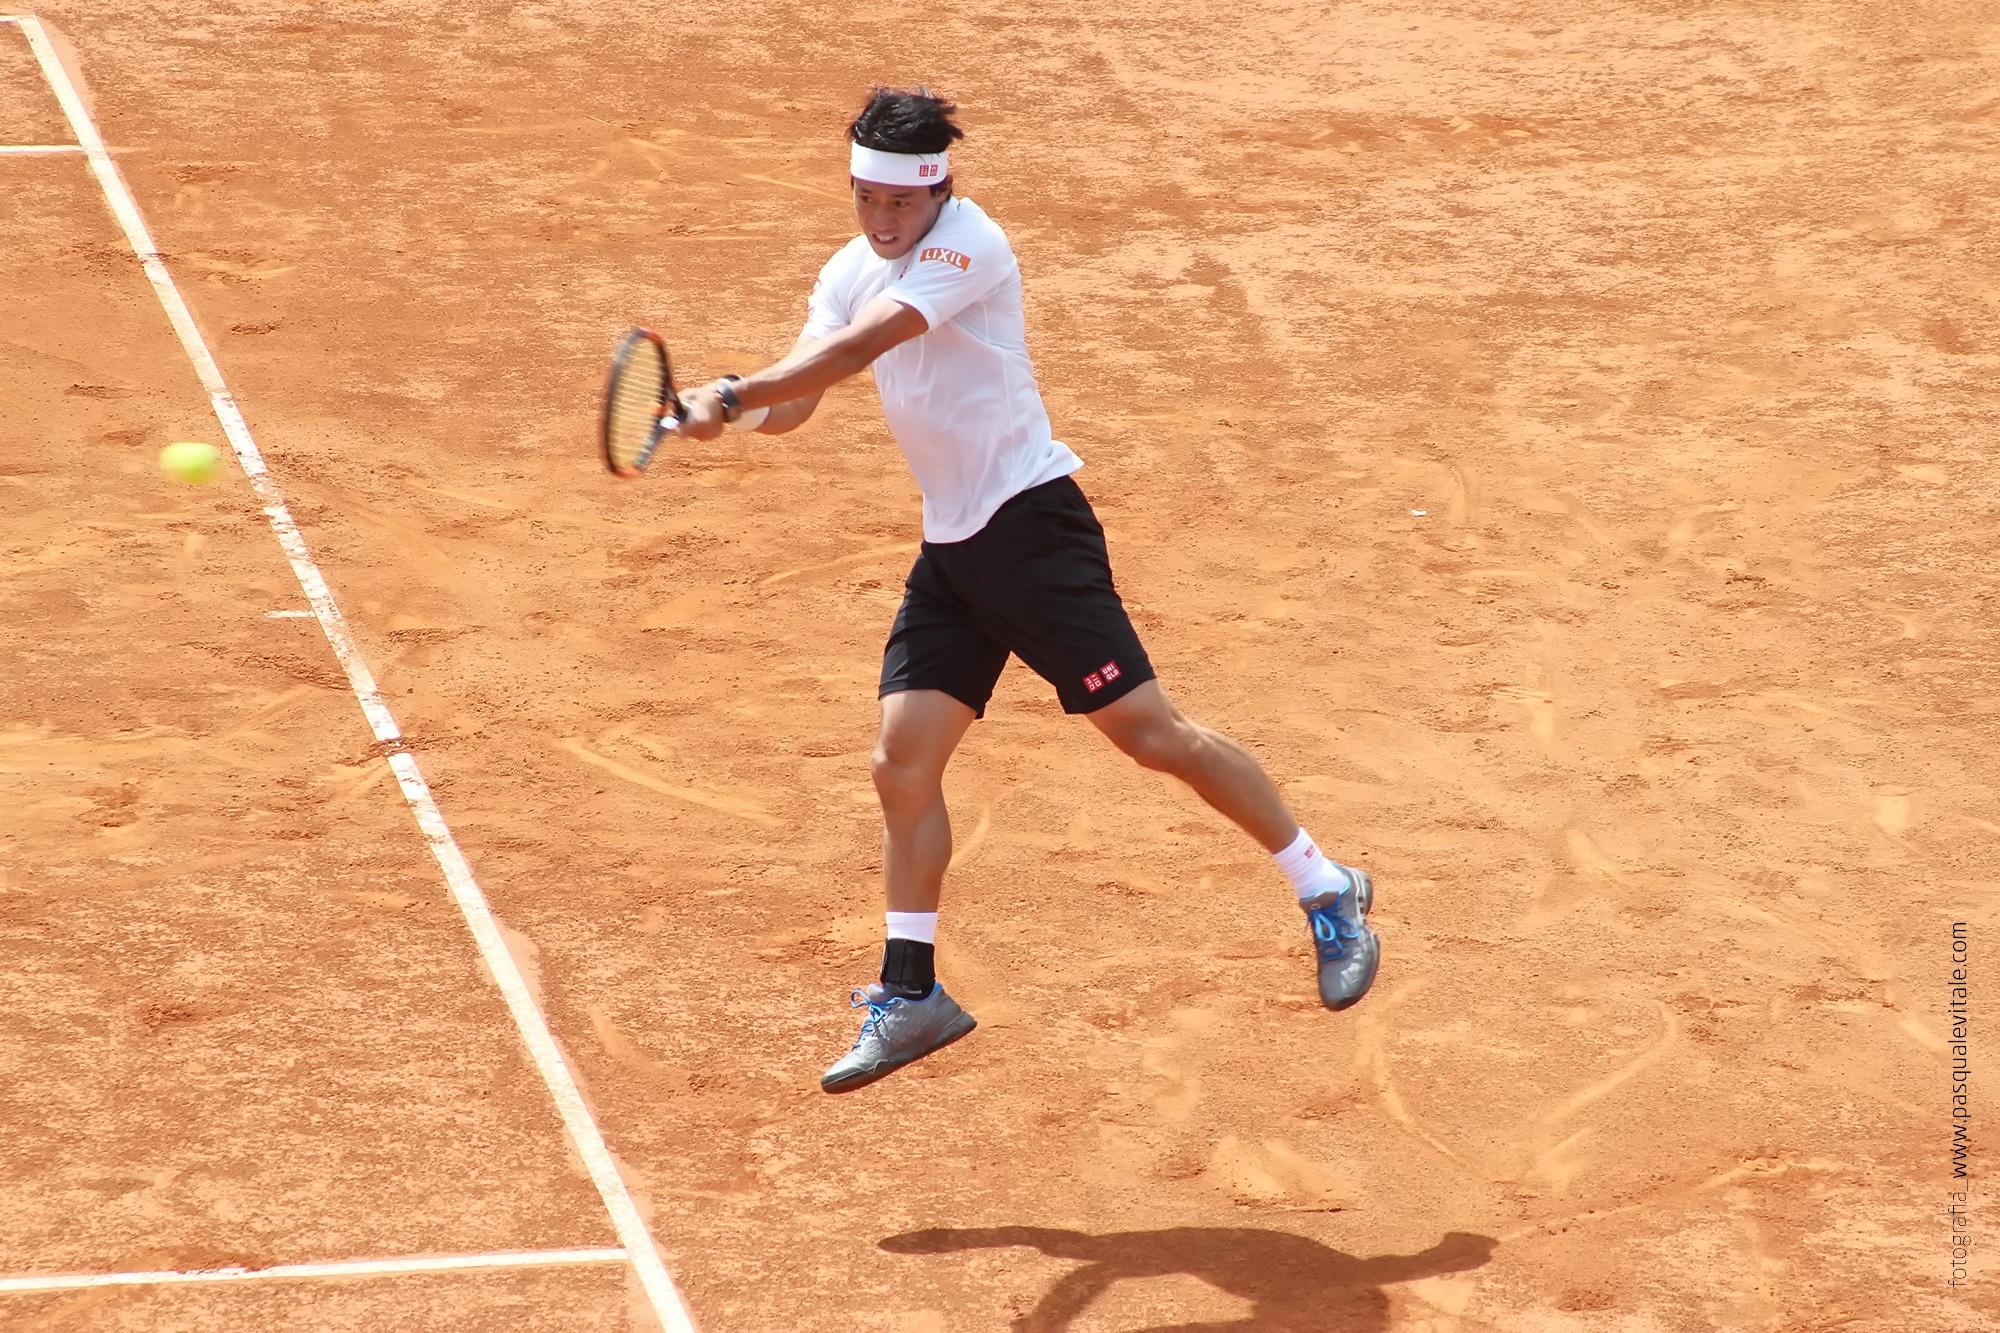 Internazionali di Tennis BNL by Pasquale Vitale